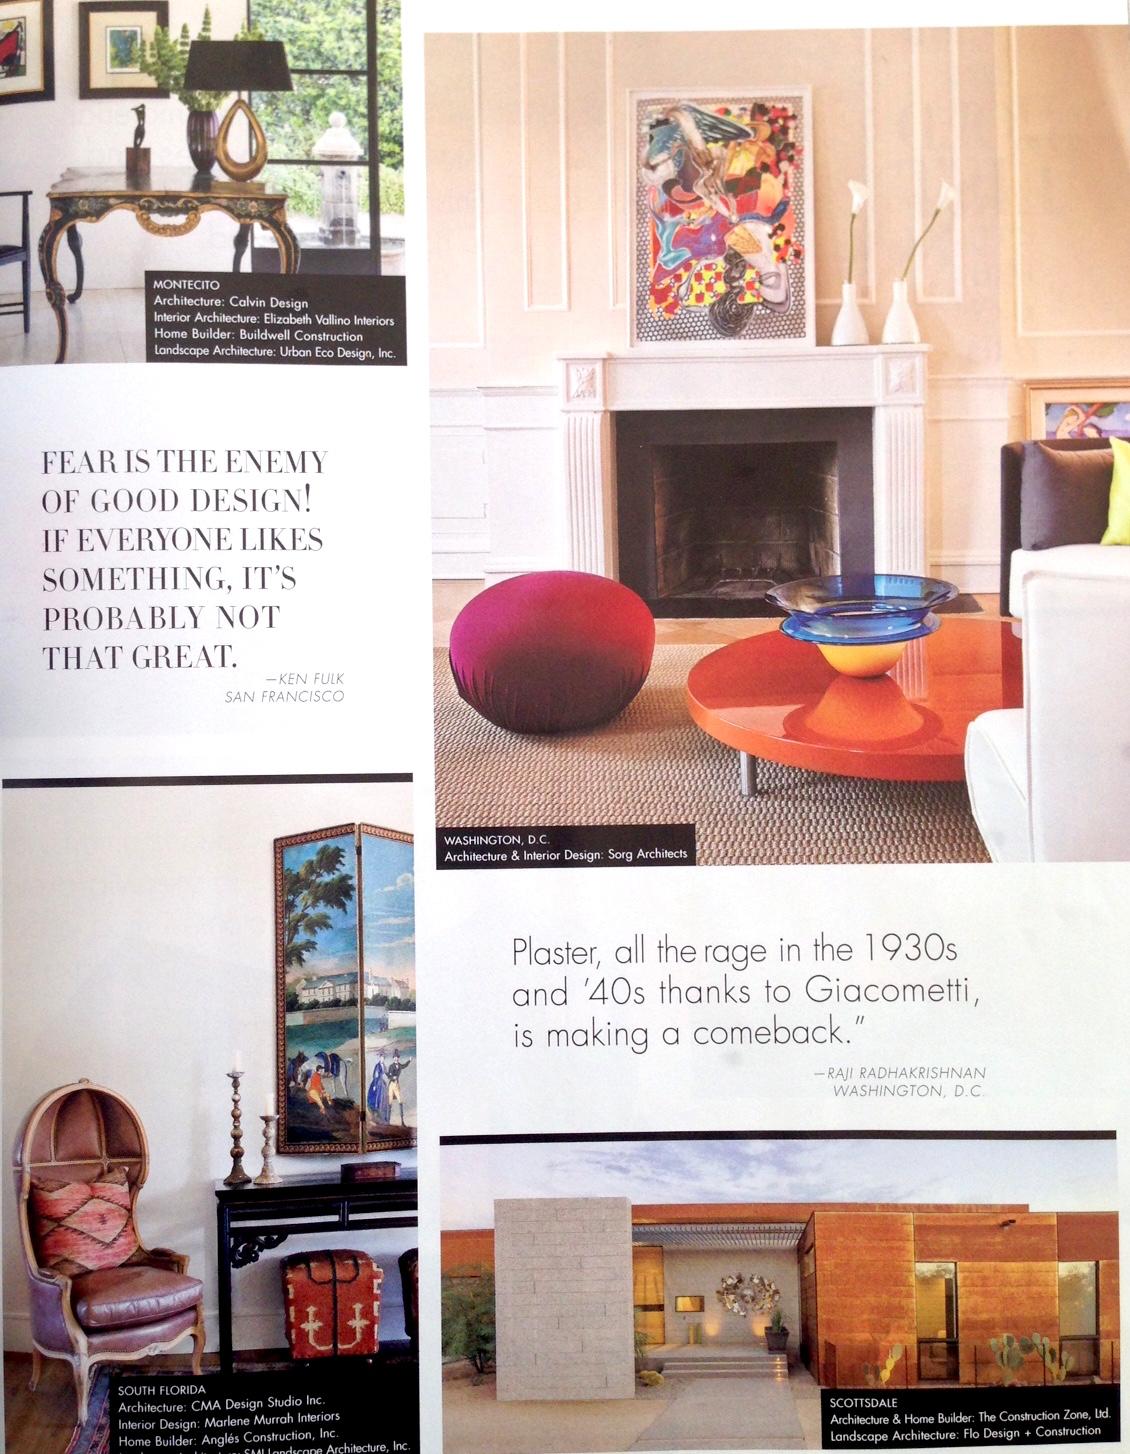 202 330 3866 - Interior Design List